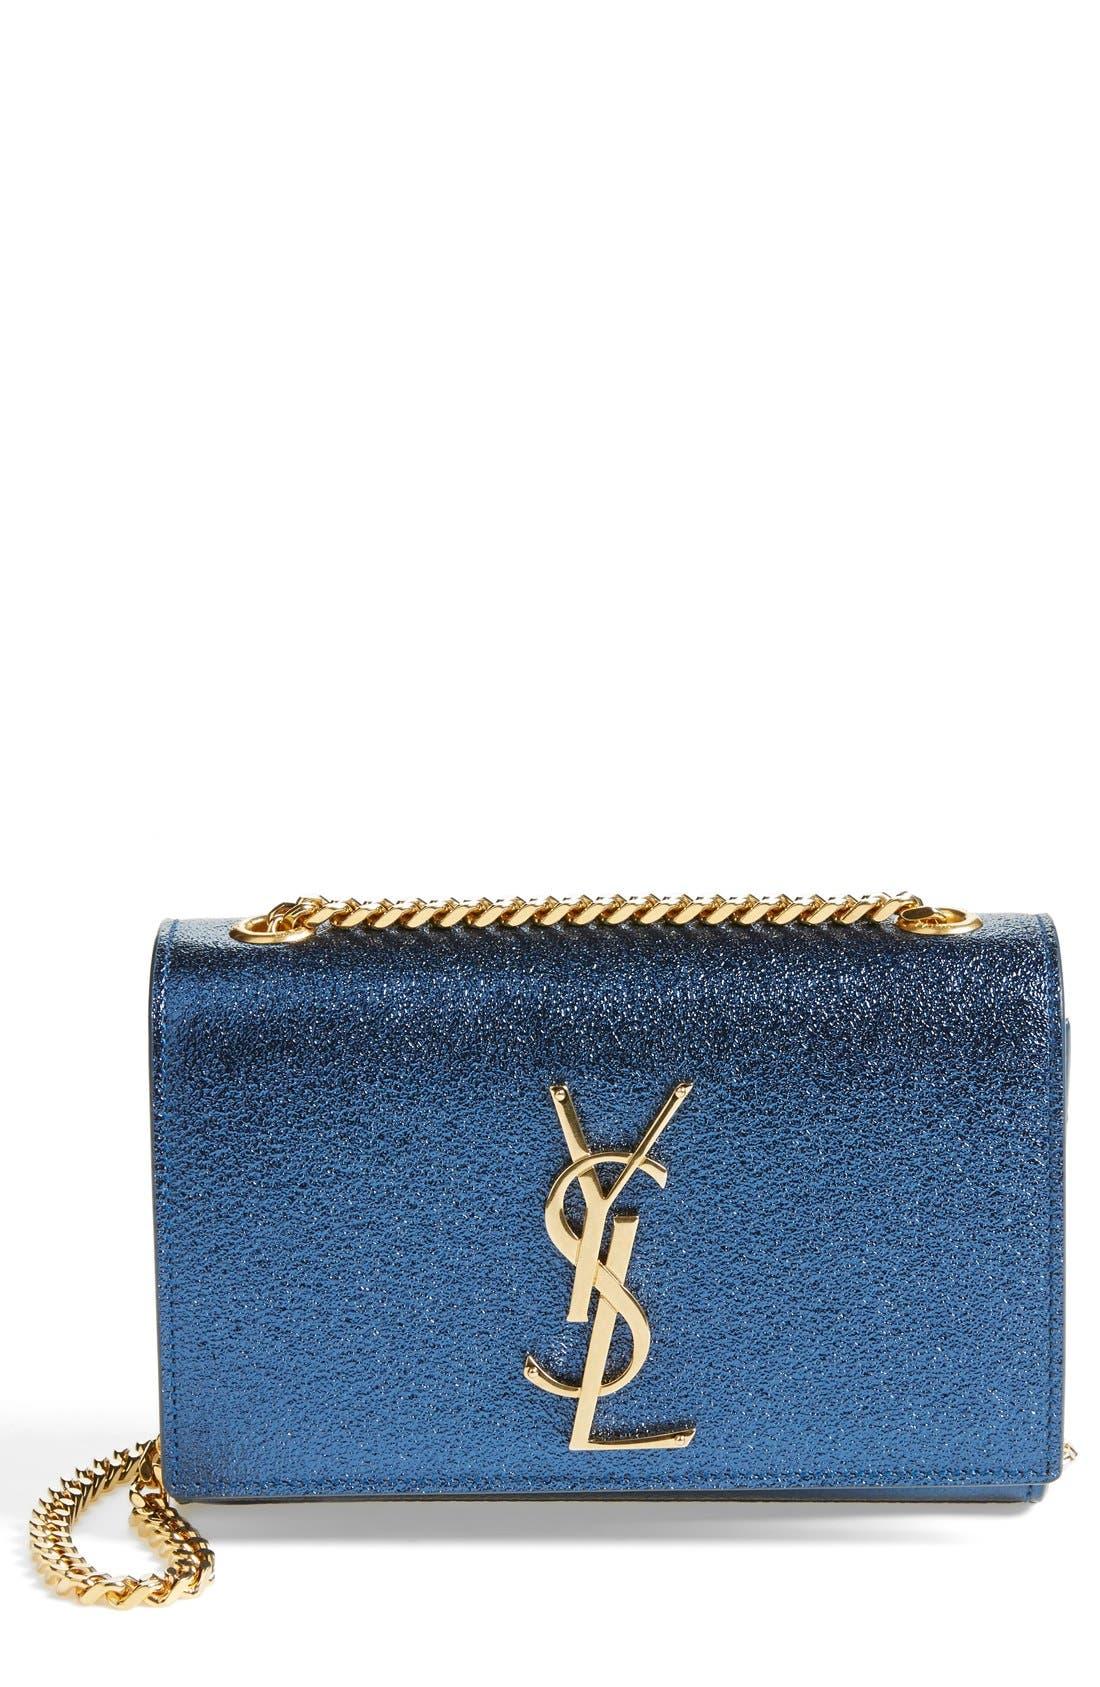 'Small Monogram' Crossbody Bag,                             Main thumbnail 1, color,